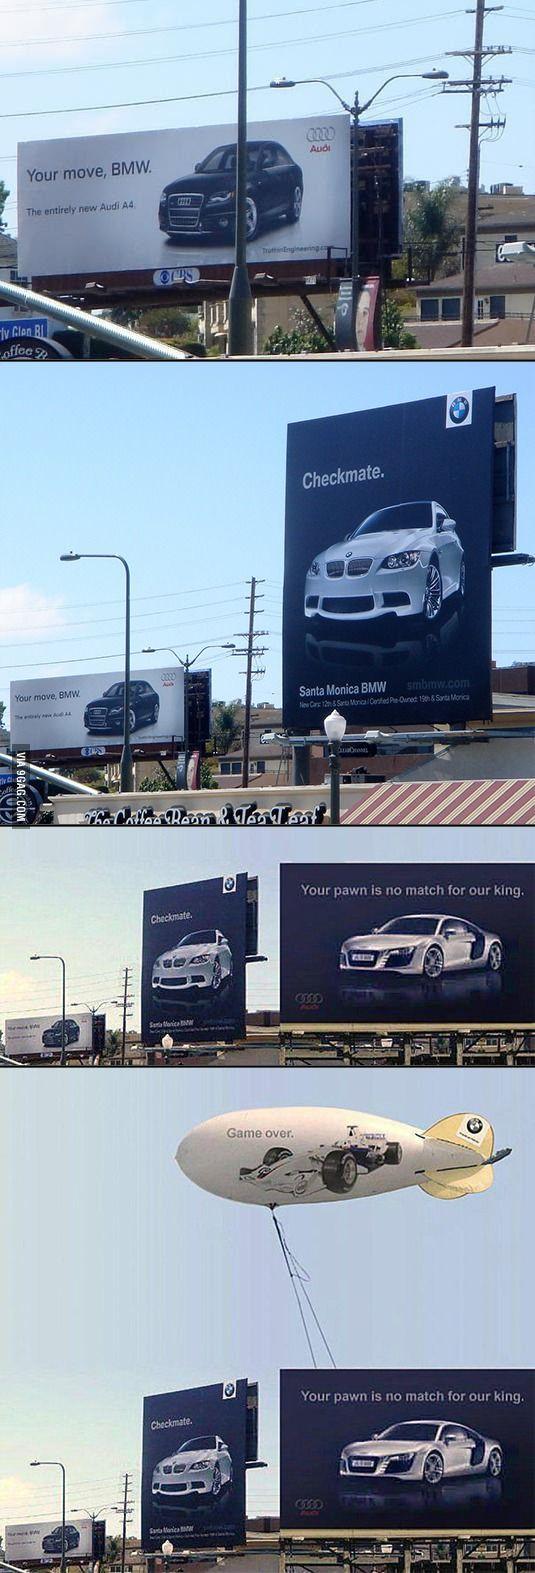 Daring Advertisement Audi Vs Bmw Graphics Pinterest Back Gt Gallery For Chess Checkmate Diagram Amusing Billboard Battle Between And Guerrilla Marketing Design